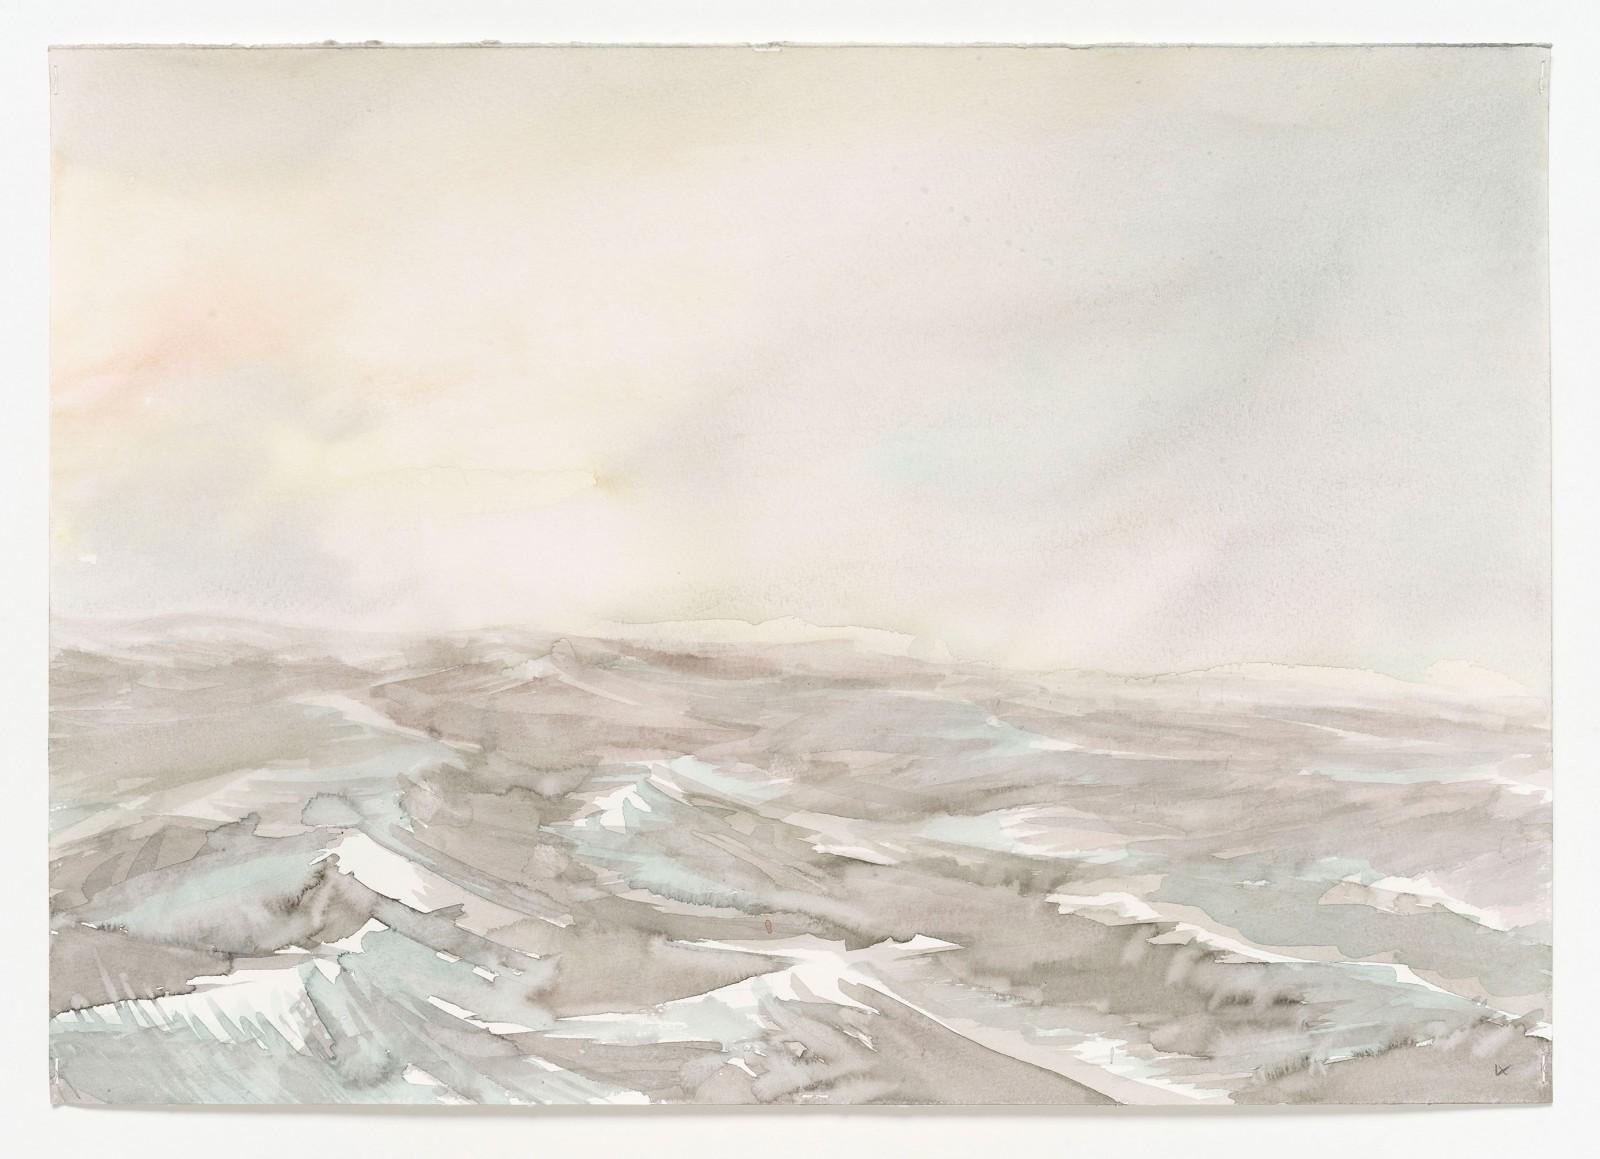 Kim Nekarda: fs heincke, tag ix , 2017, watercolour on paper, 39 x 56cm